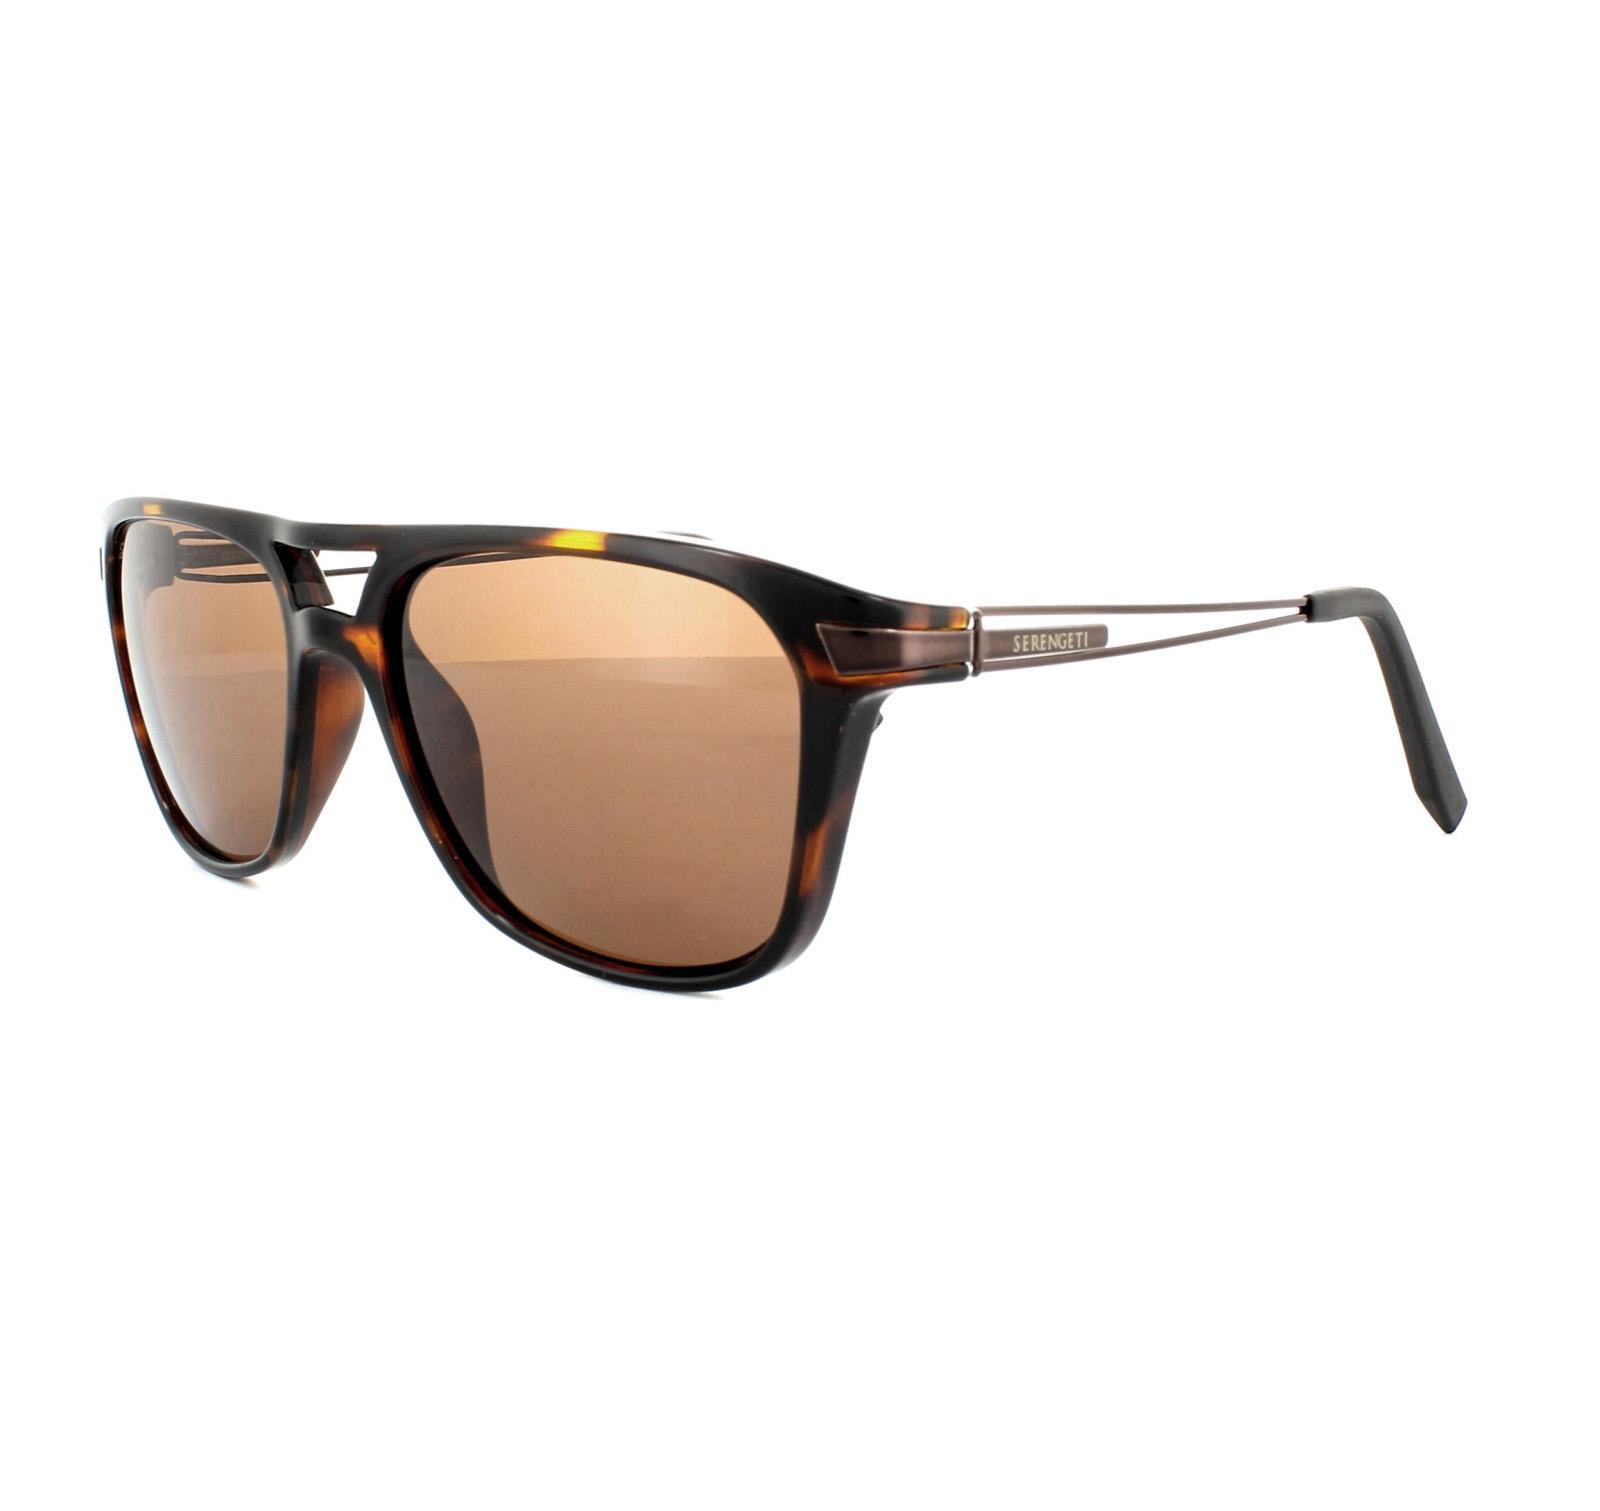 0583c558c2 Sentinel Serengeti Sunglasses Empoli 7761 Dark Tortoise Espresso Drivers Brown  Polarized